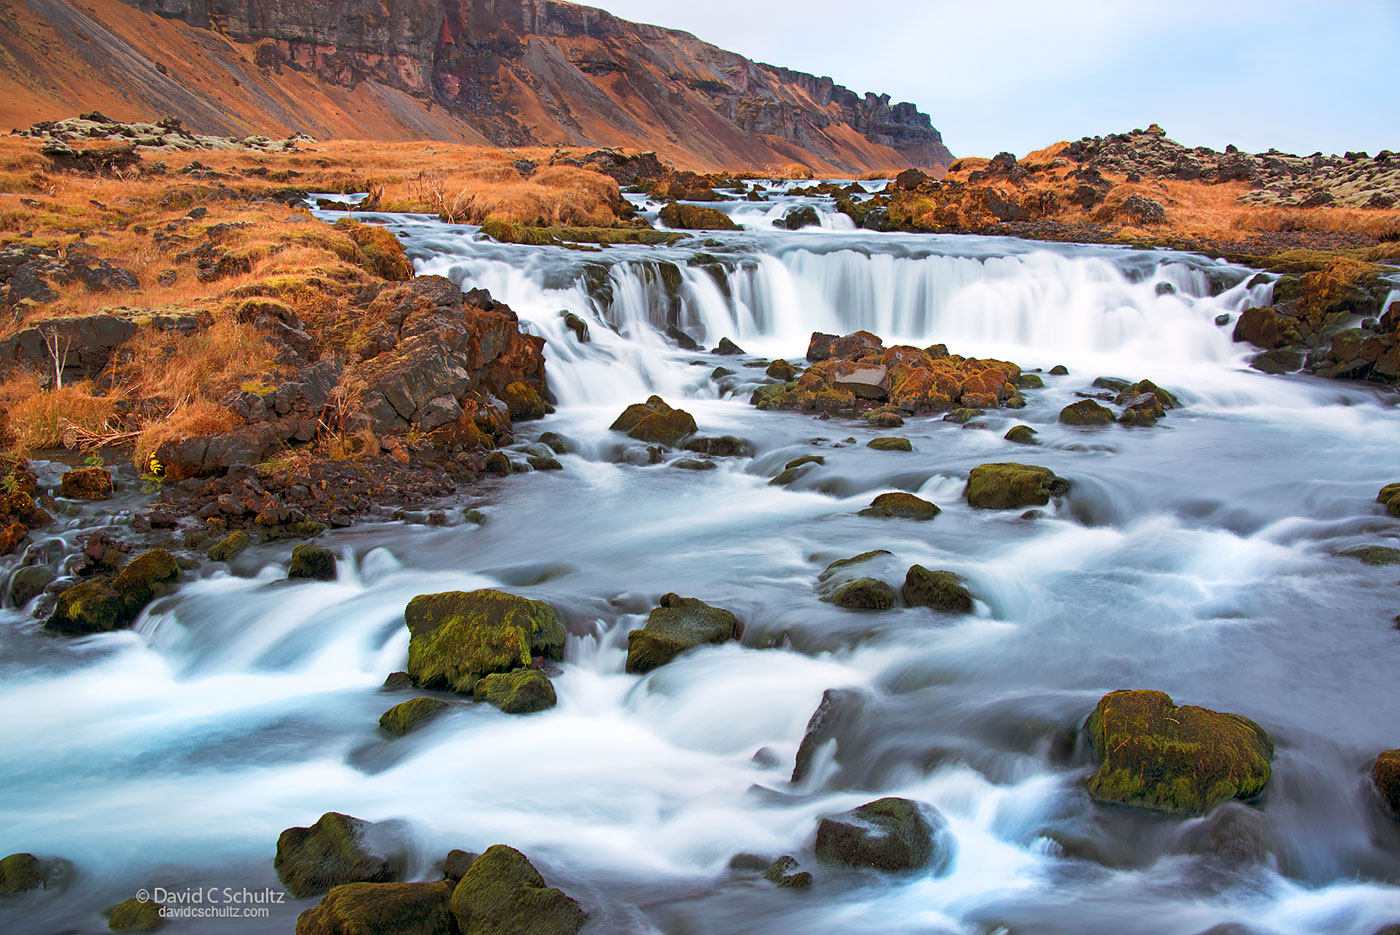 Iceland Waterfall - Image #211-4